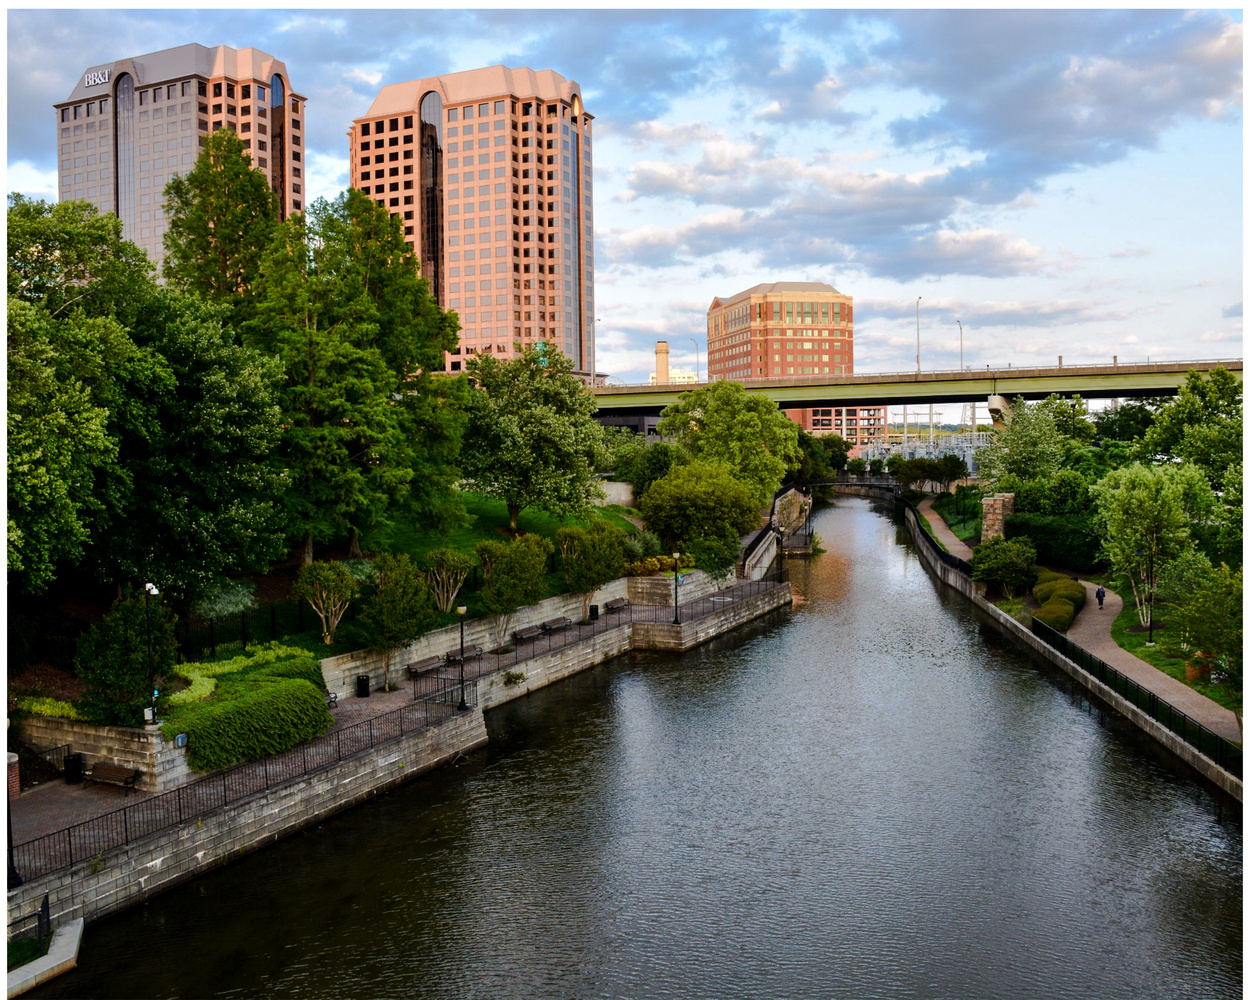 Canal Walk by Joseph Stokes